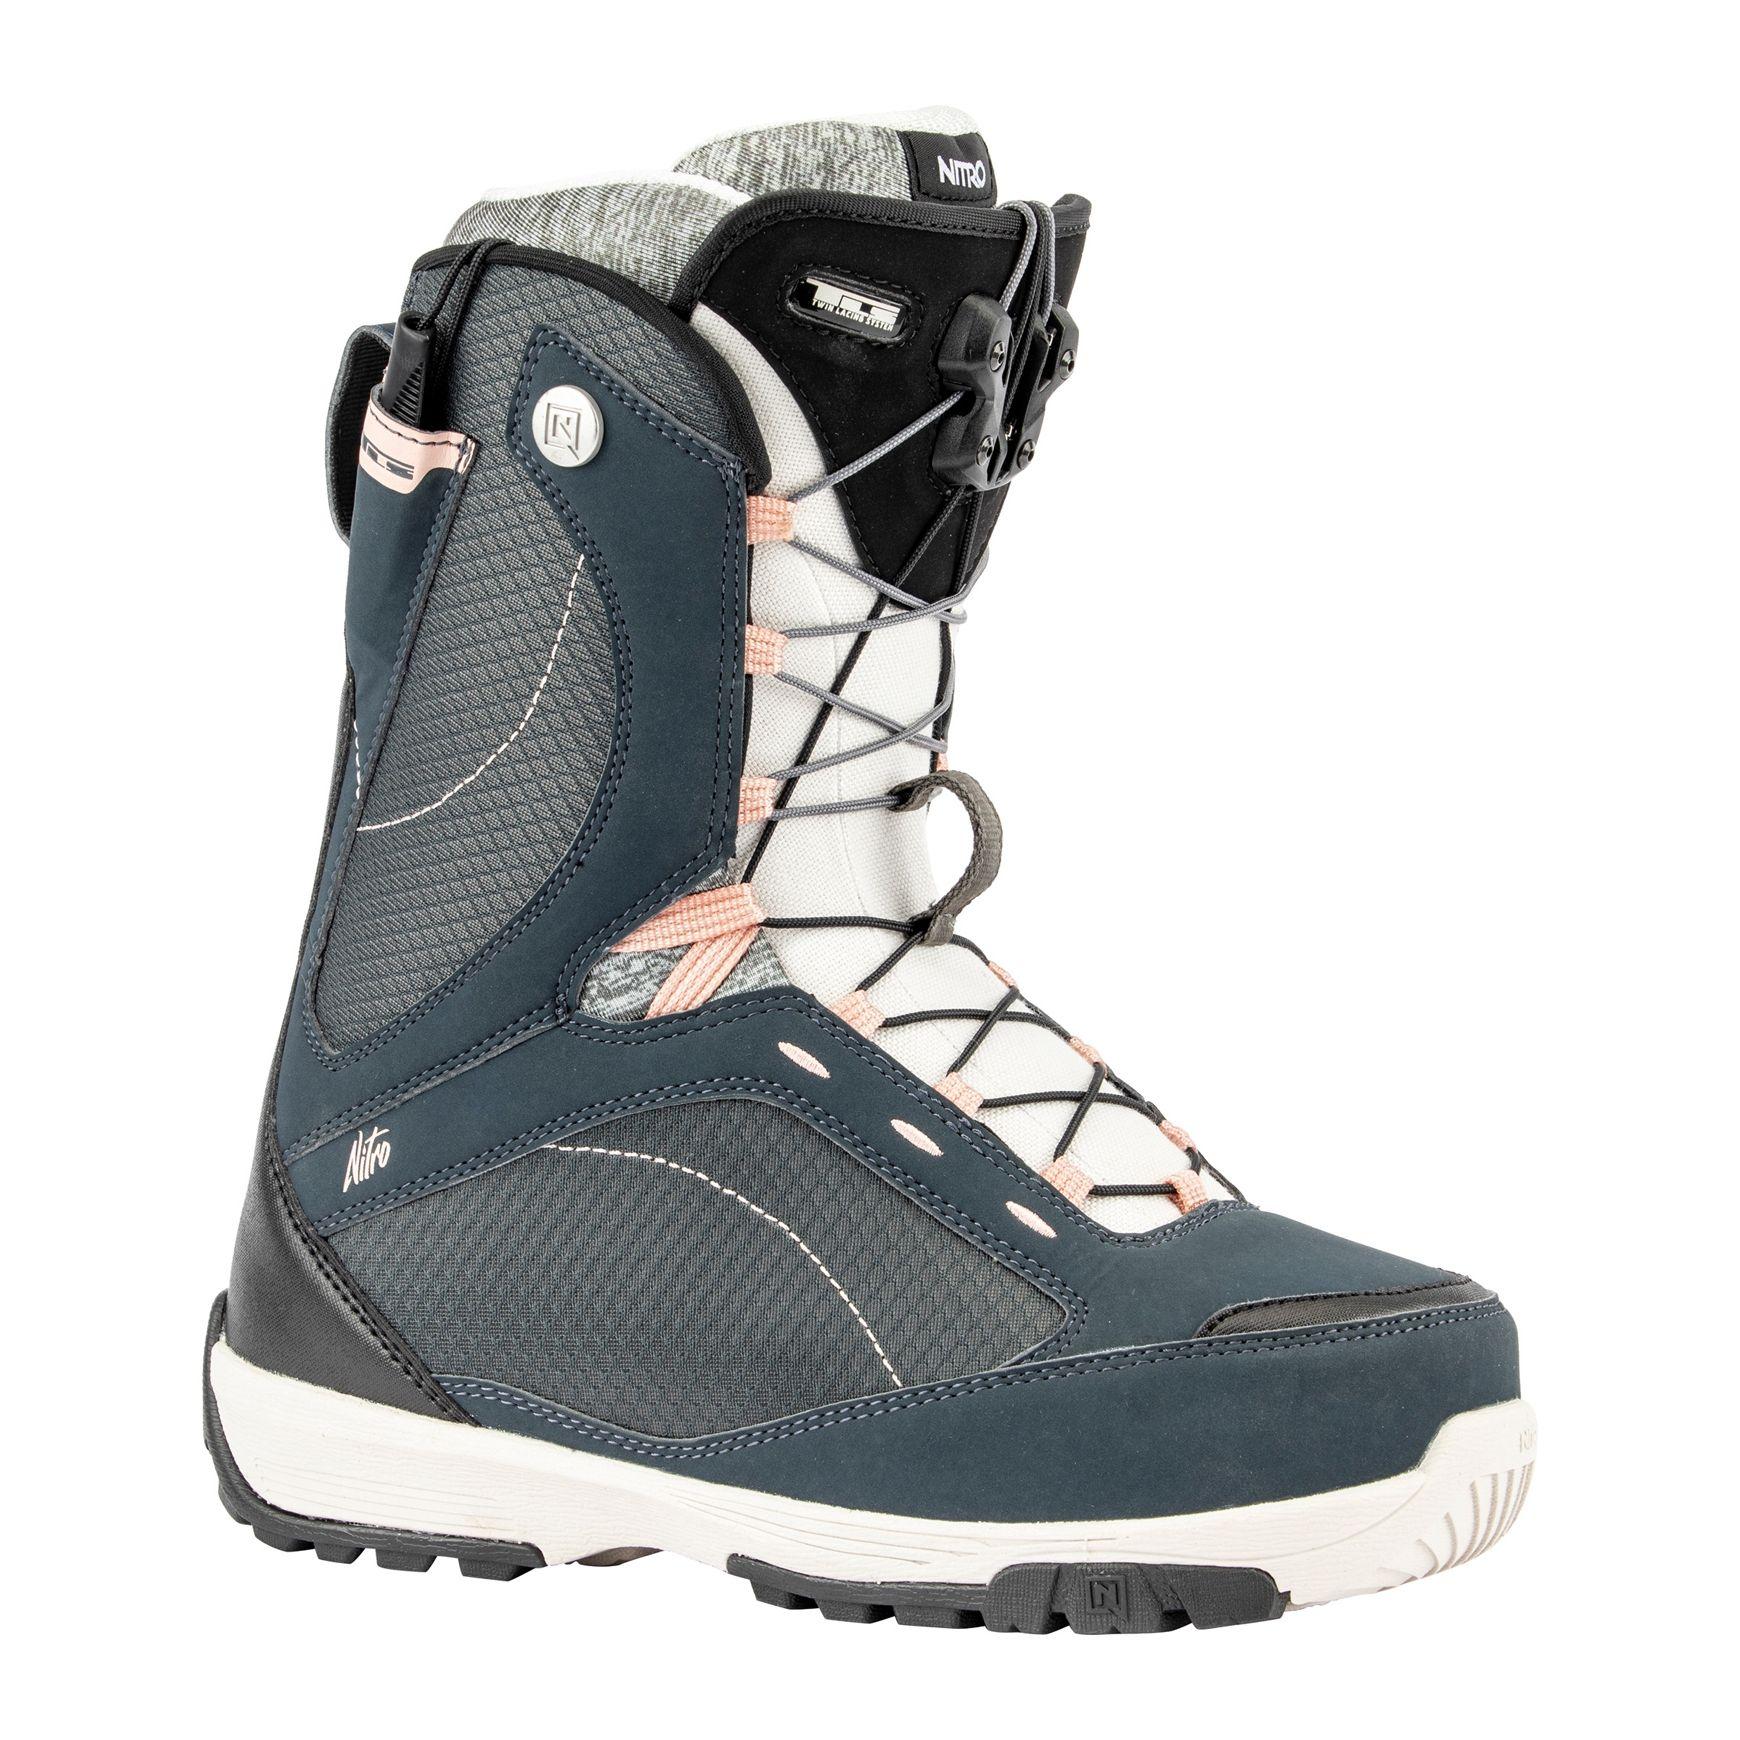 Boots snowboard femei Nitro Monarch TLS Bleumarin 19/20 imagine